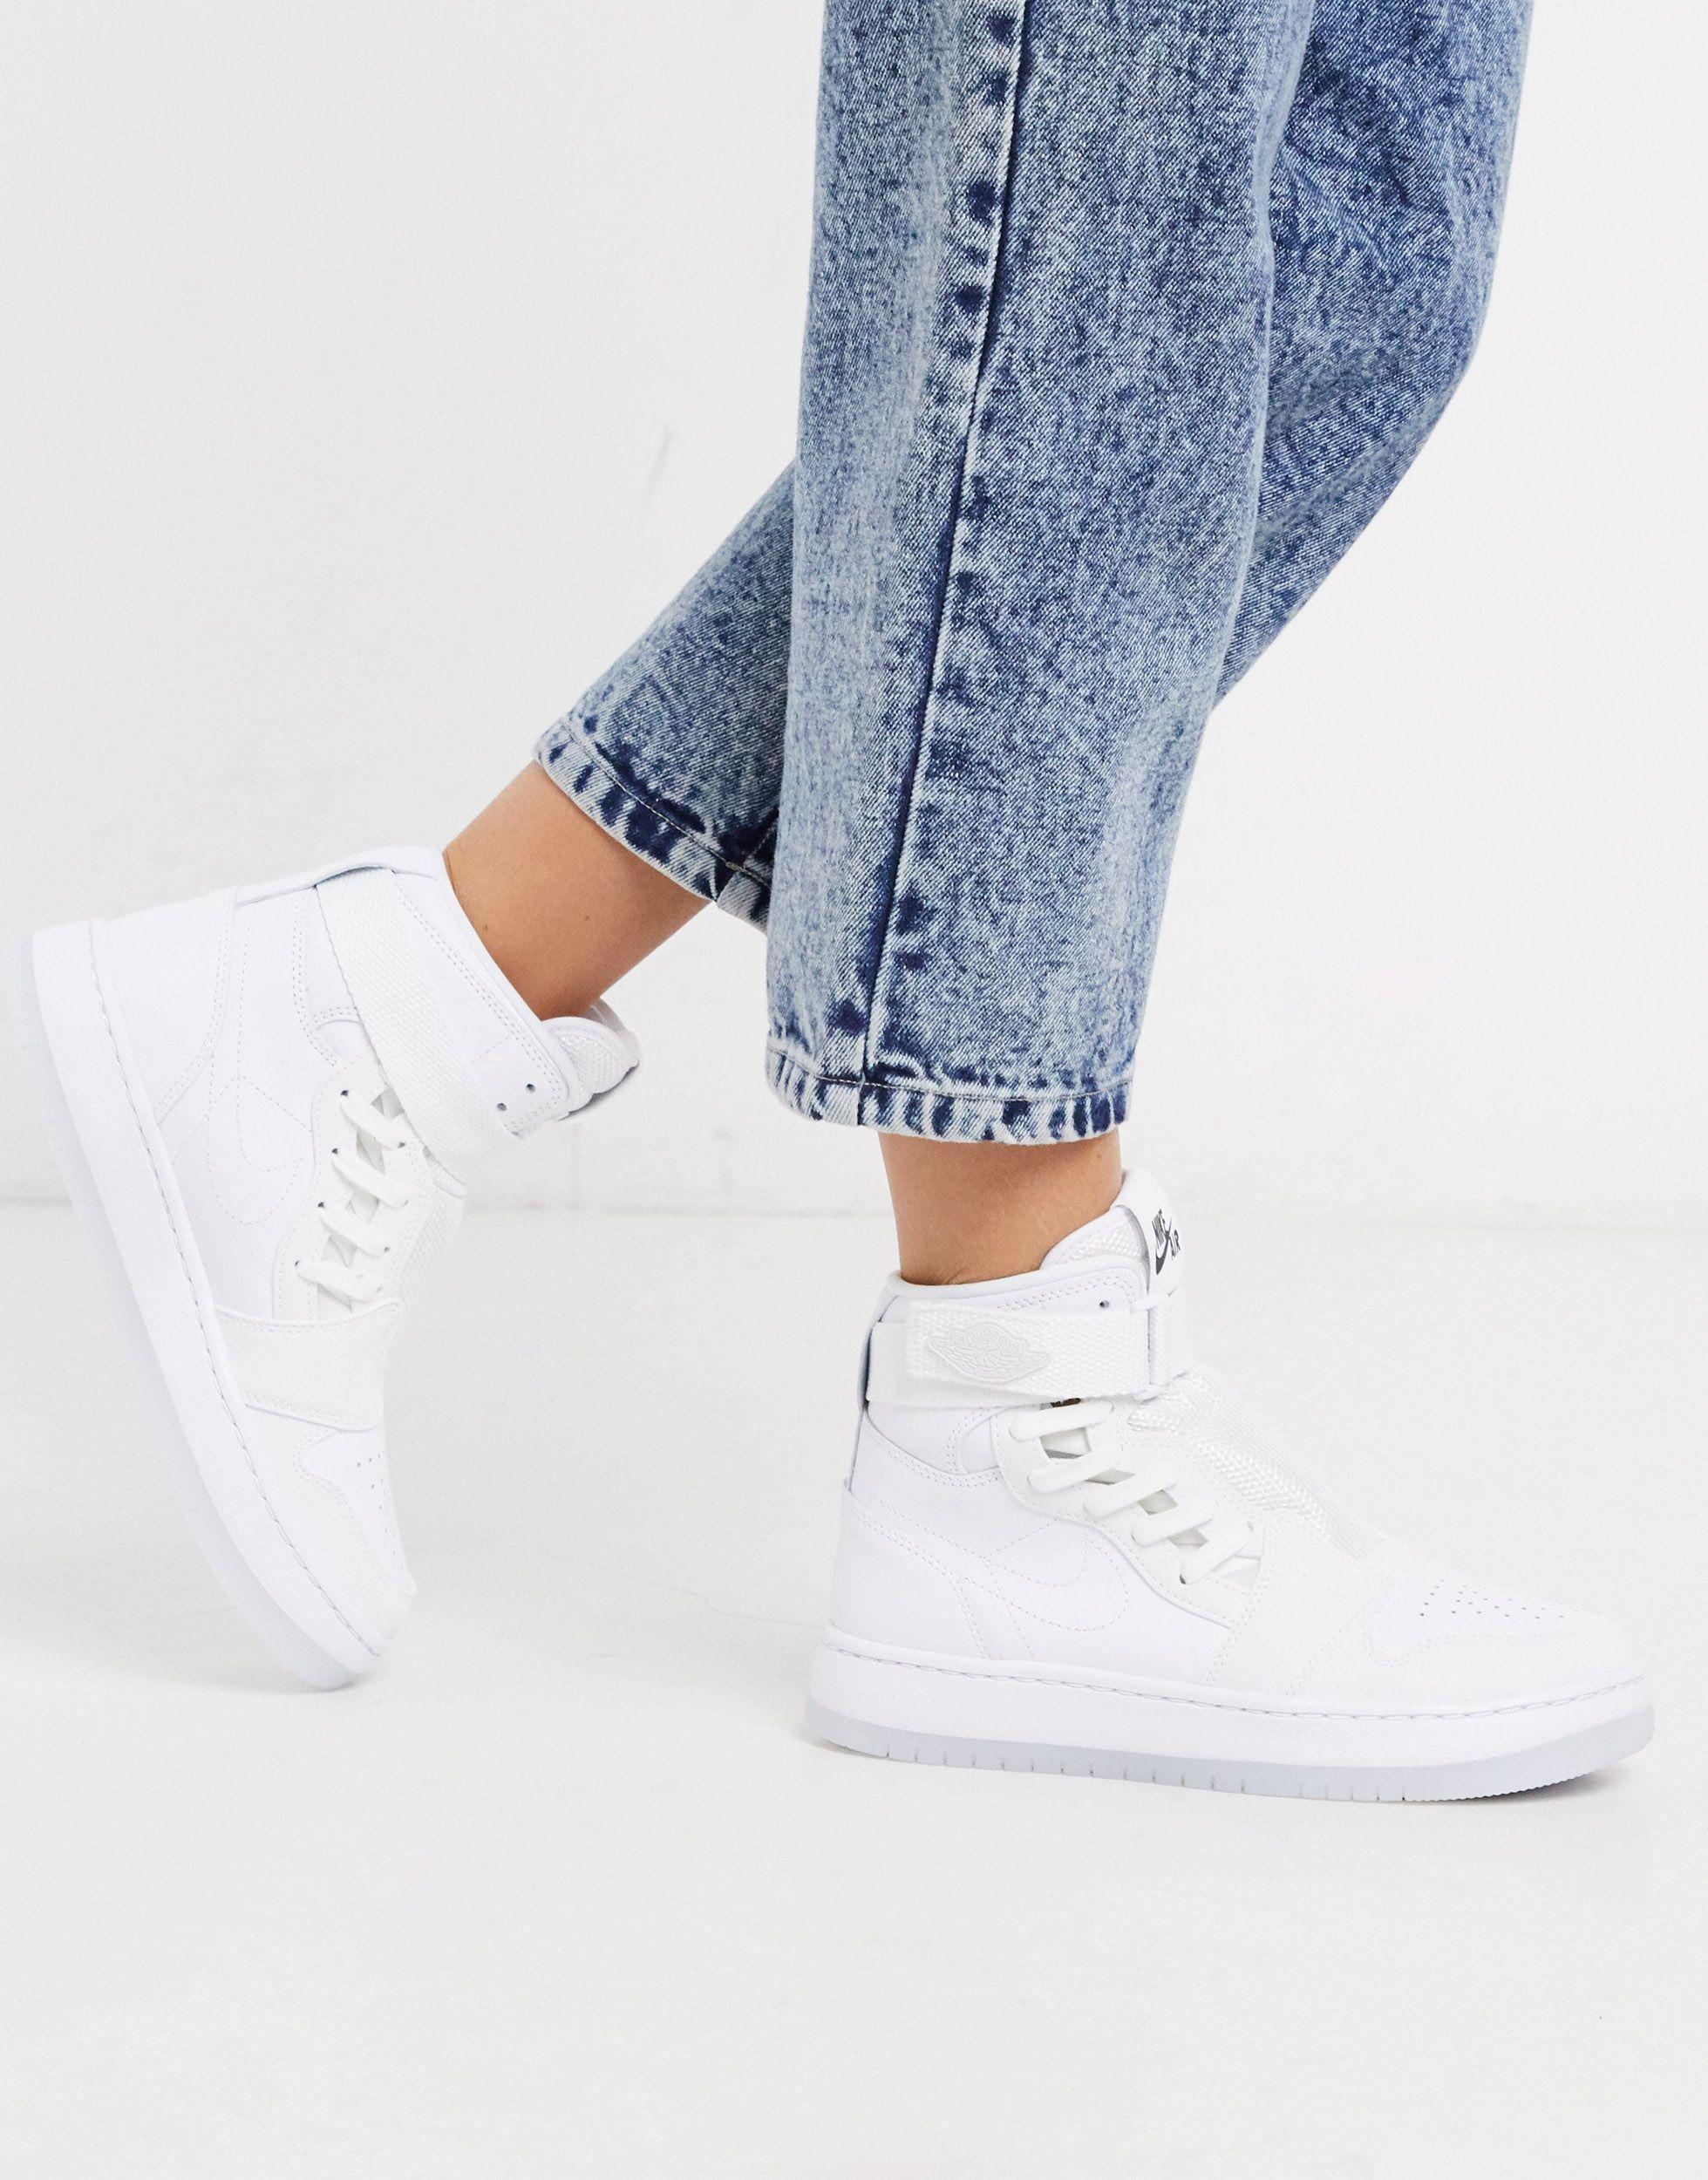 Nike Leather Air Jordan 1 Nova Xx Shoe in White & Black (White) - Lyst